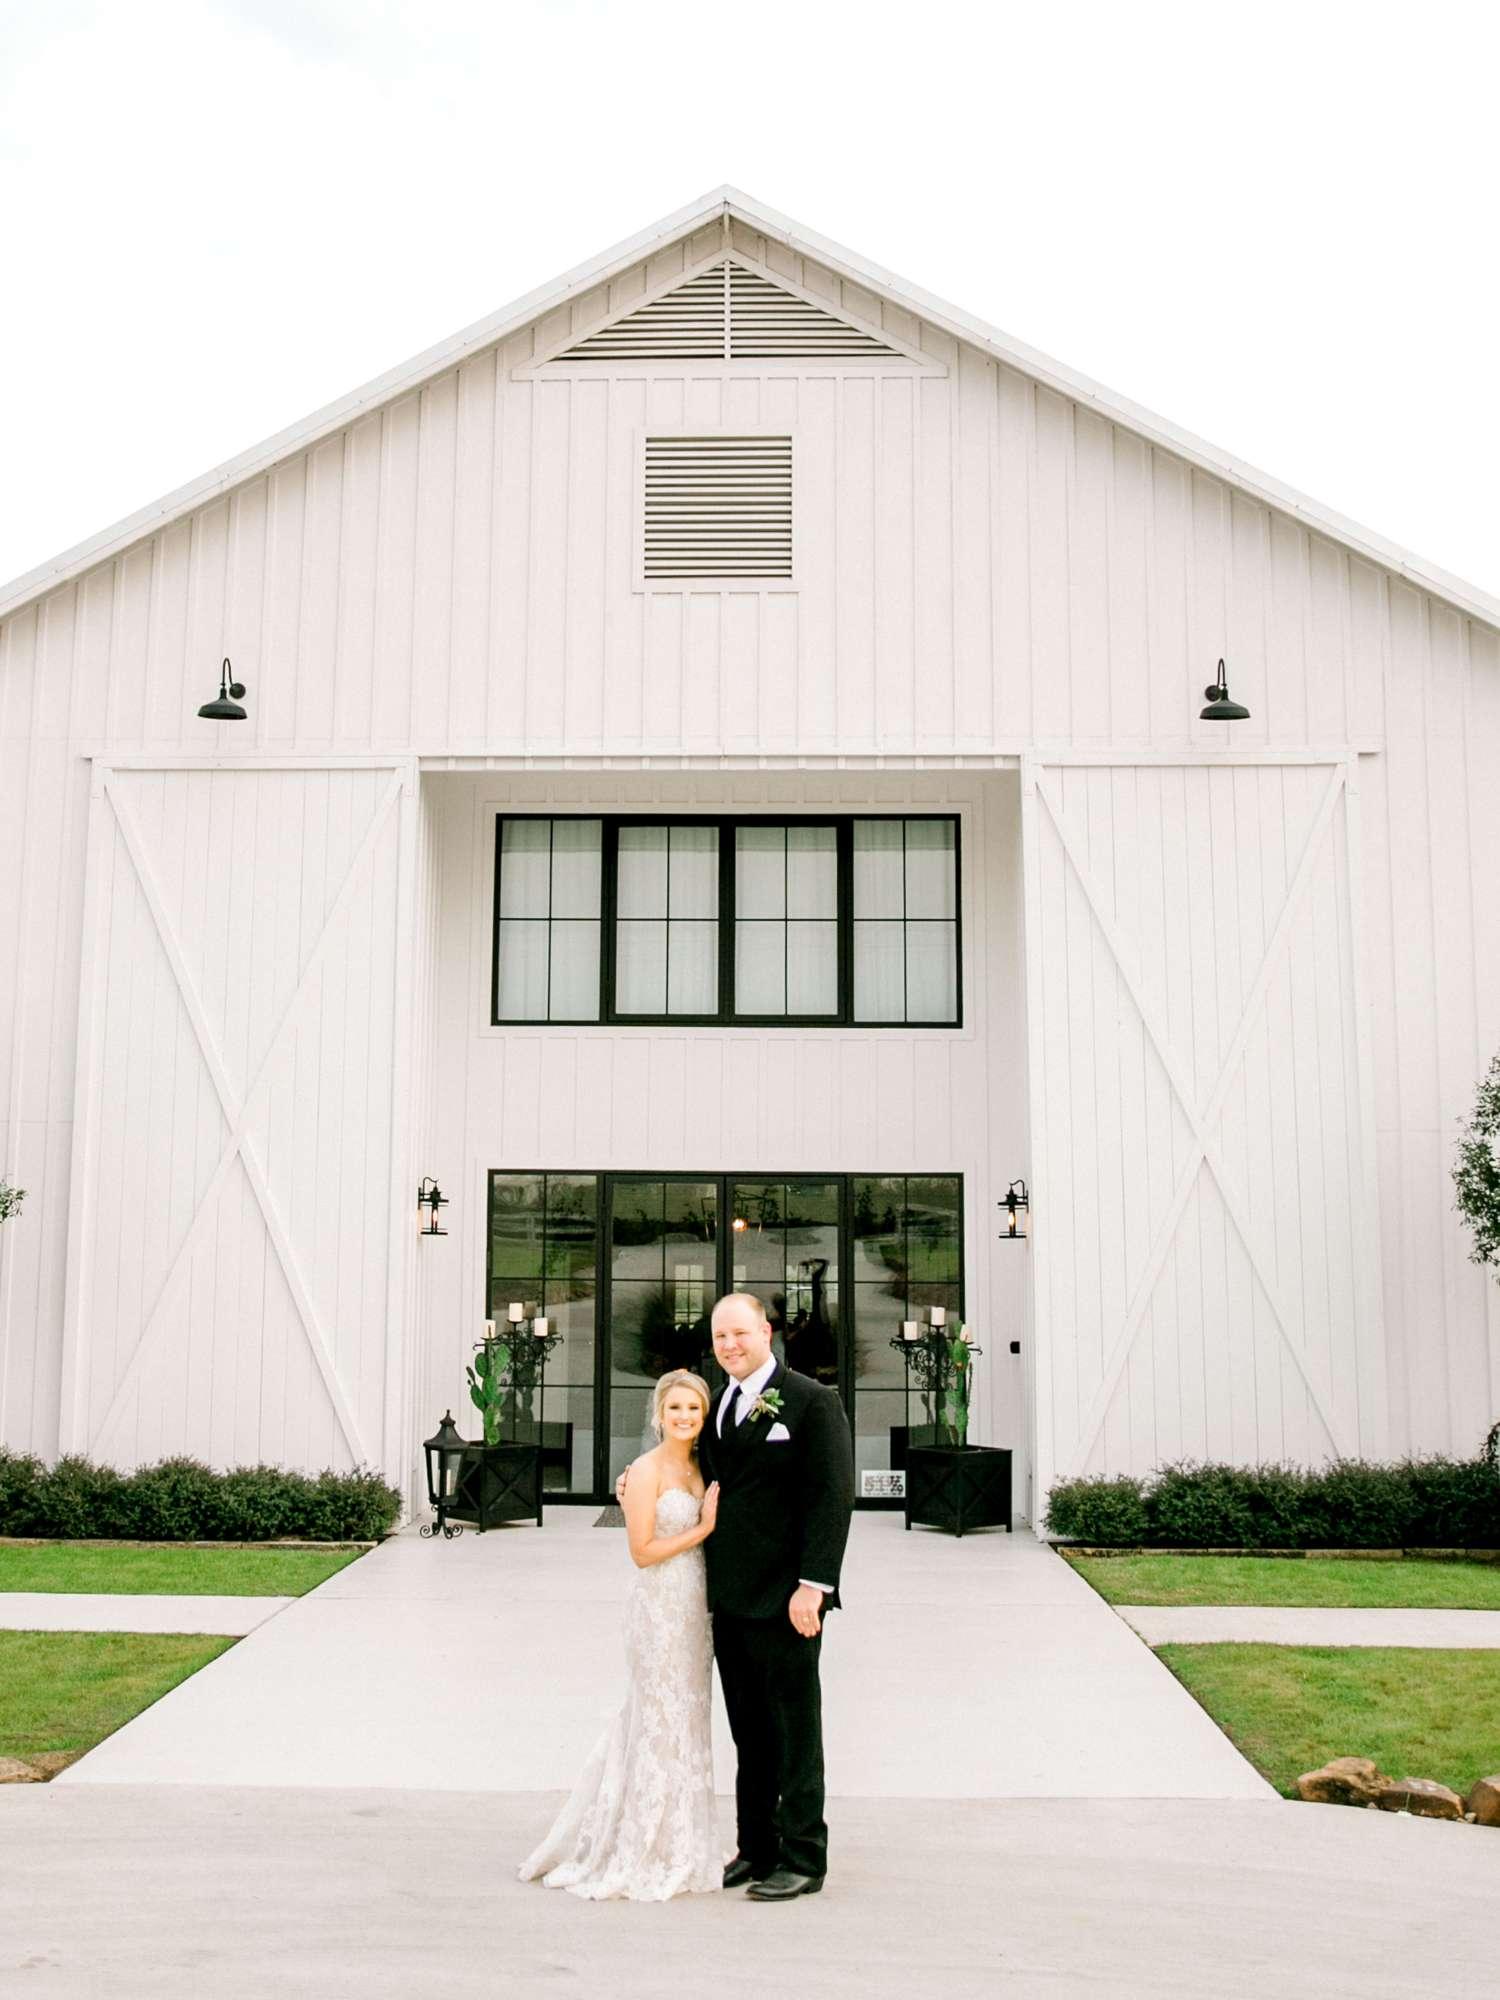 HEBERT_MORGAN_AND_CLAY_ALLEEJ_THE_FARMHOUSE_MONTGOMERY_TEXAS_WEDDING_0147.jpg